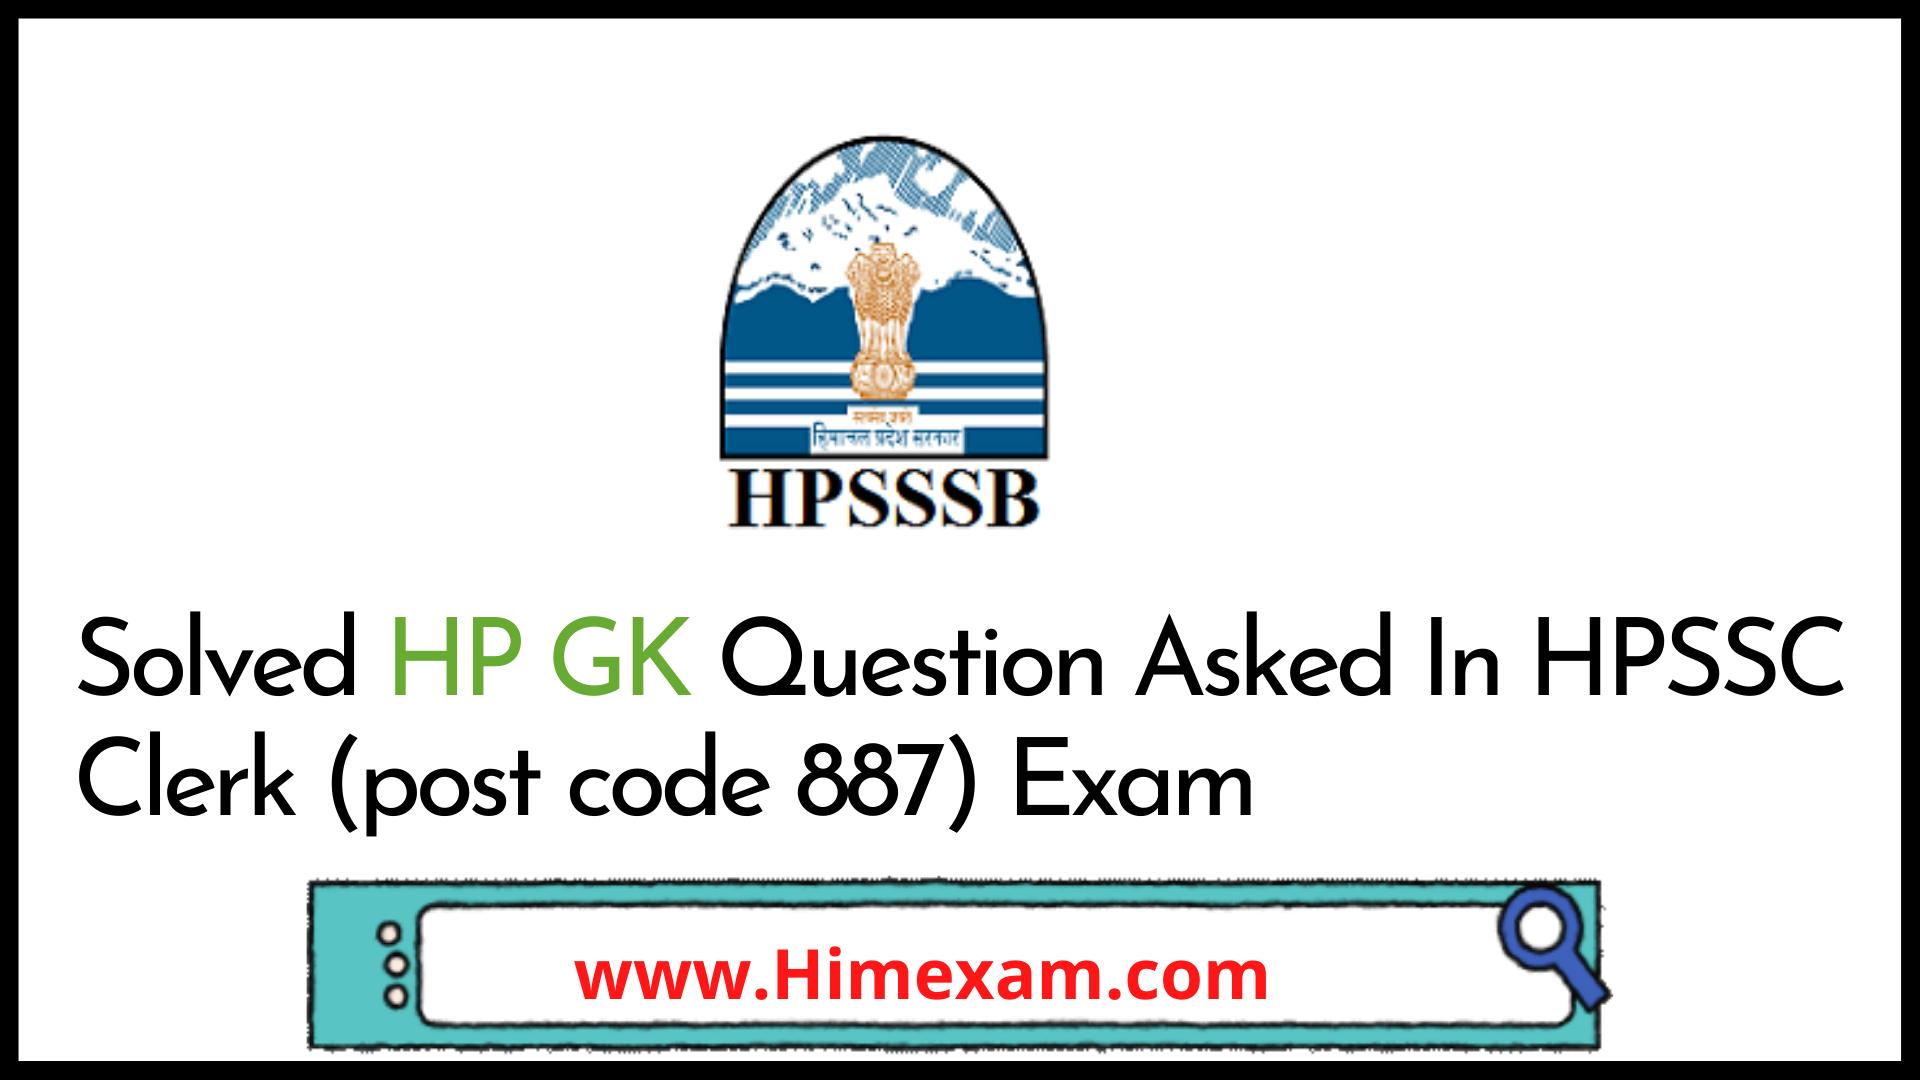 Solved HP GK Question Asked In HPSSC Clerk (post code 887) Exam